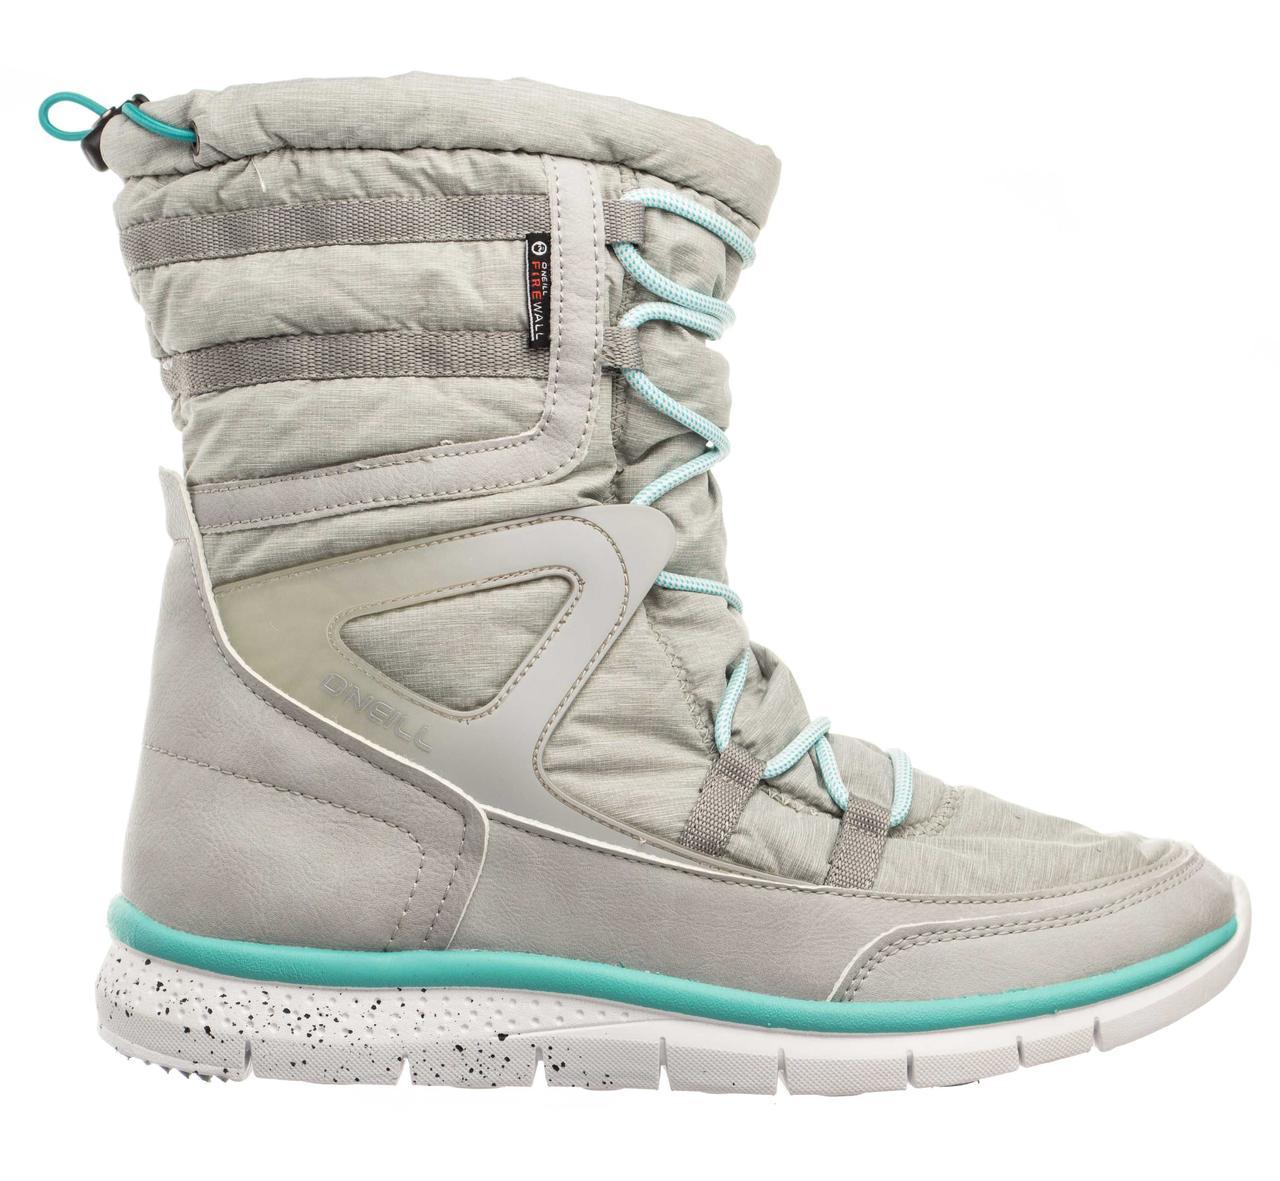 Жіночі чоботи O'Neill Zephyr LT Snowboot 41 White